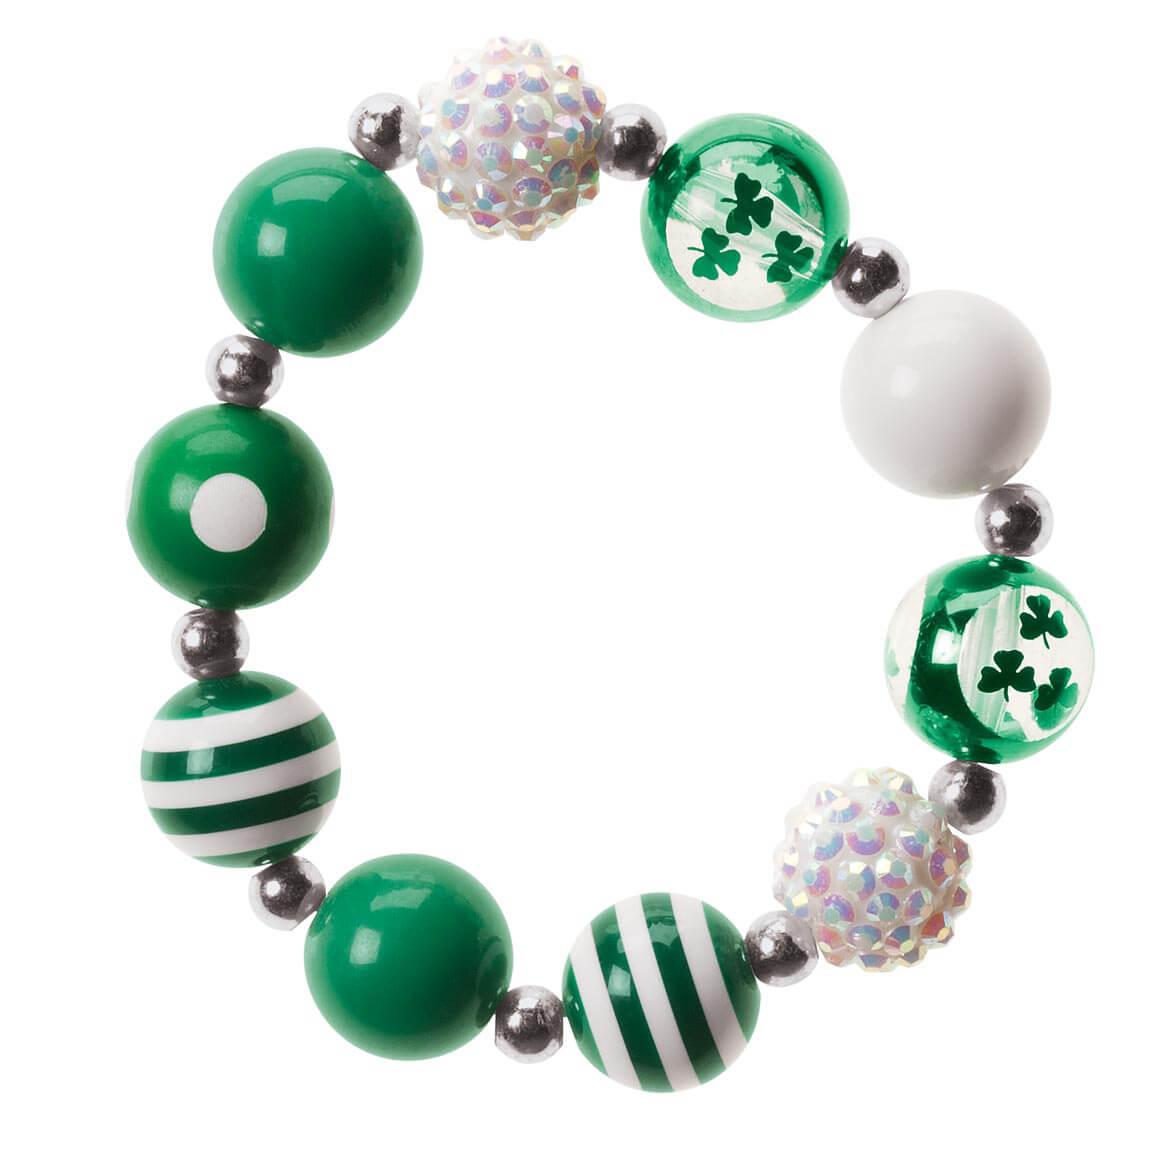 St. Patrick's Day Bling Strech Bracelet